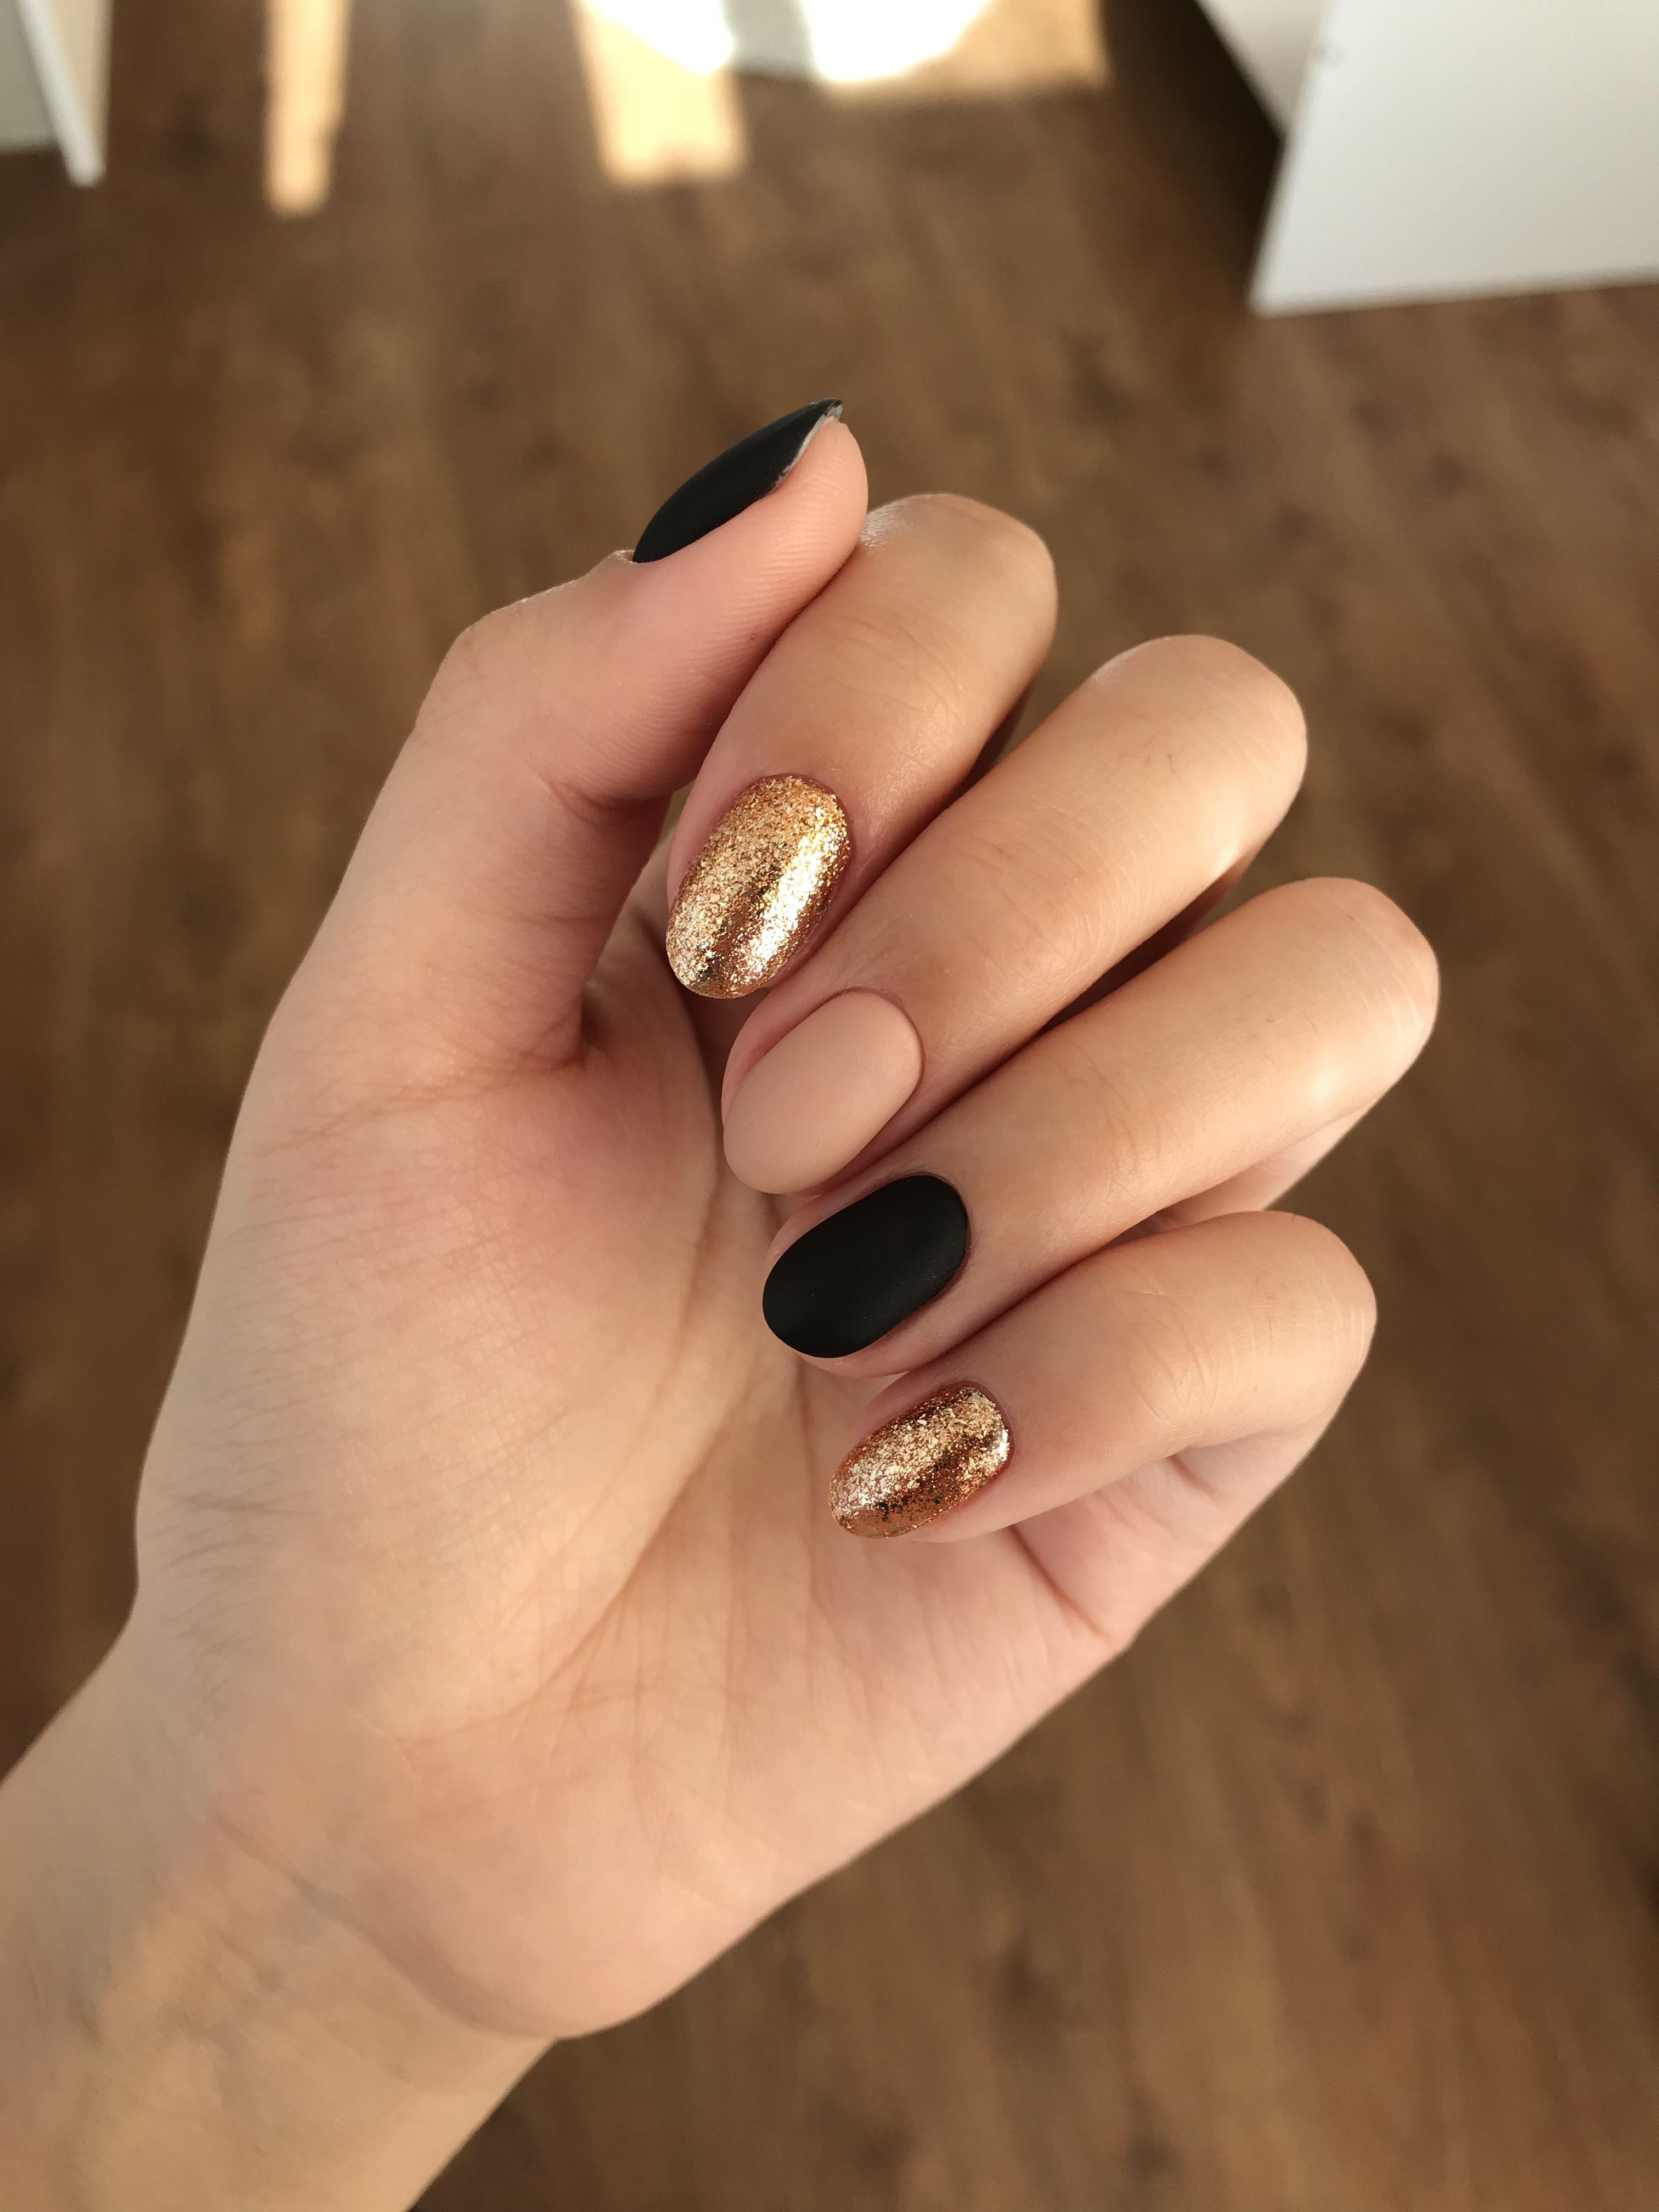 Pin by bridgette tallulah fifi barnes on nail design in